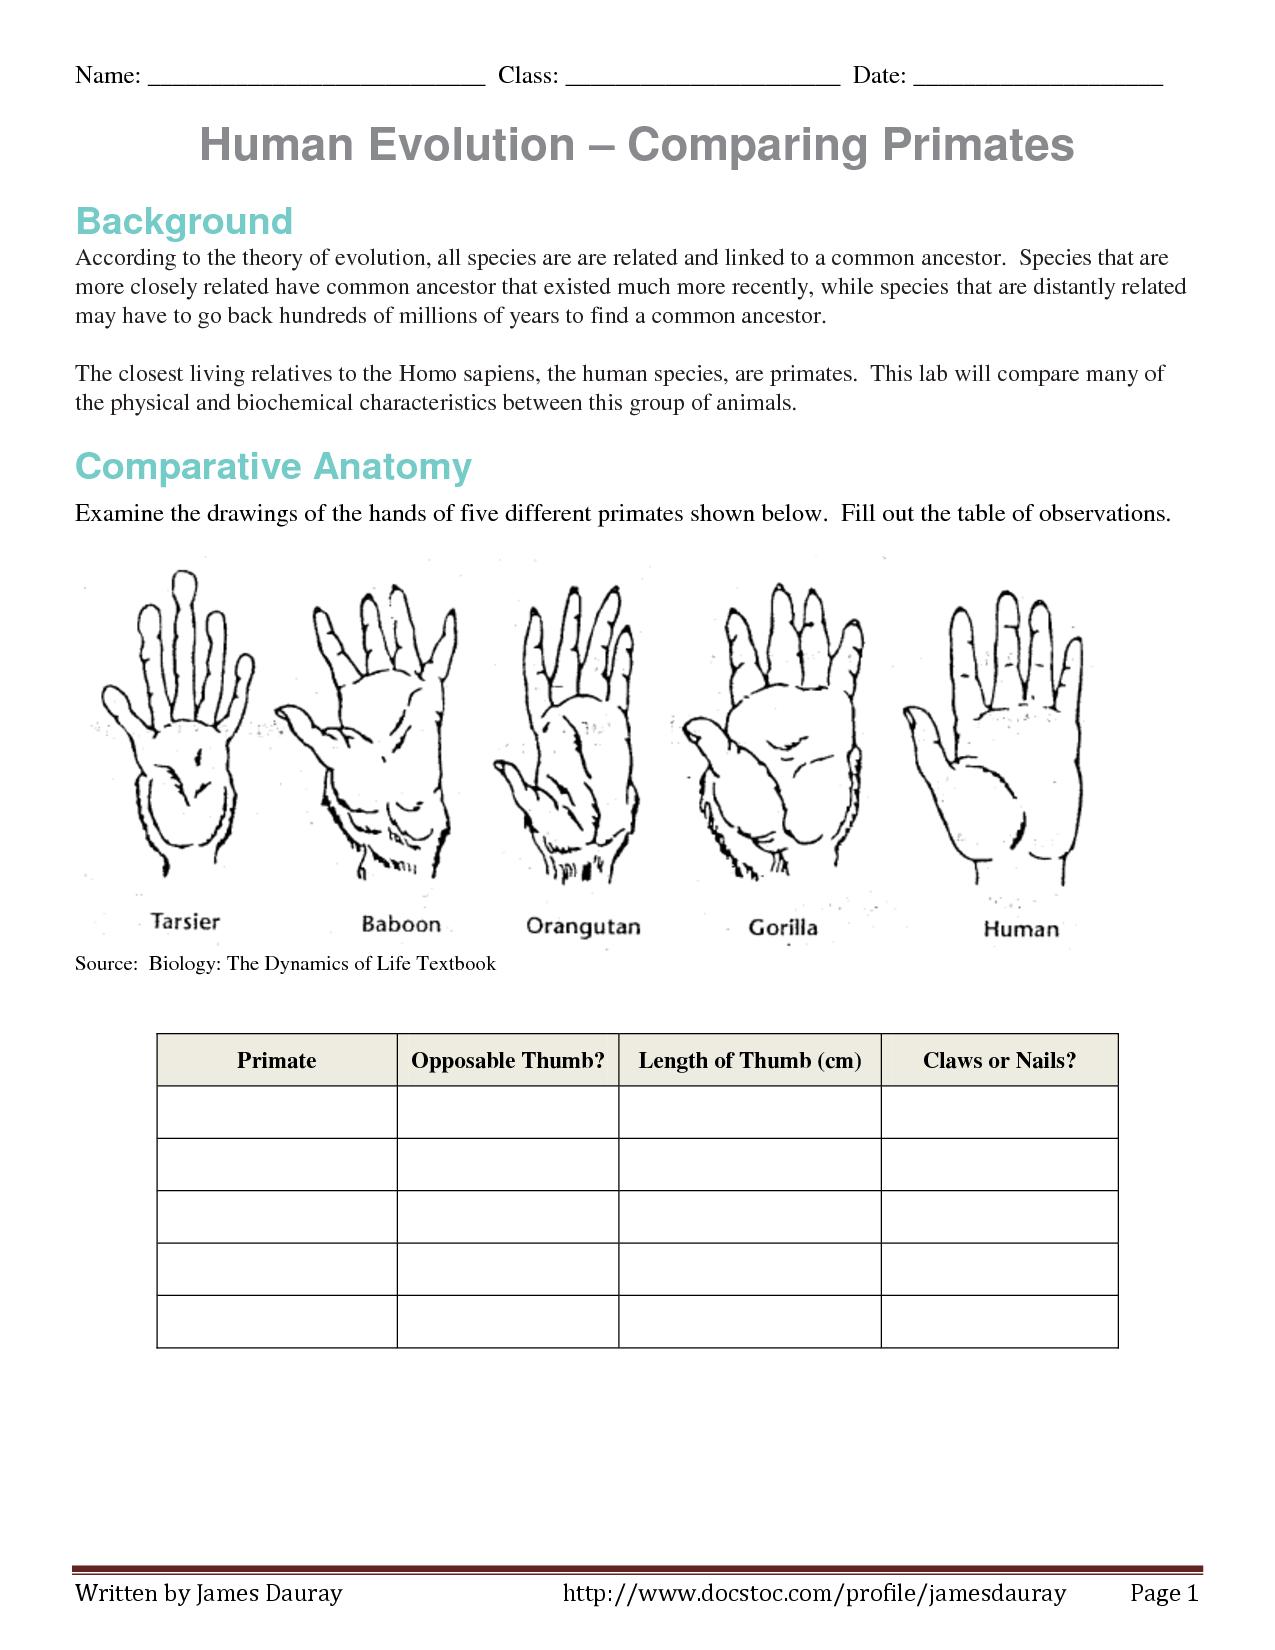 Comparative Anatomy Worksheet Answers - Anatomy Drawing Diagram [ 1650 x 1275 Pixel ]